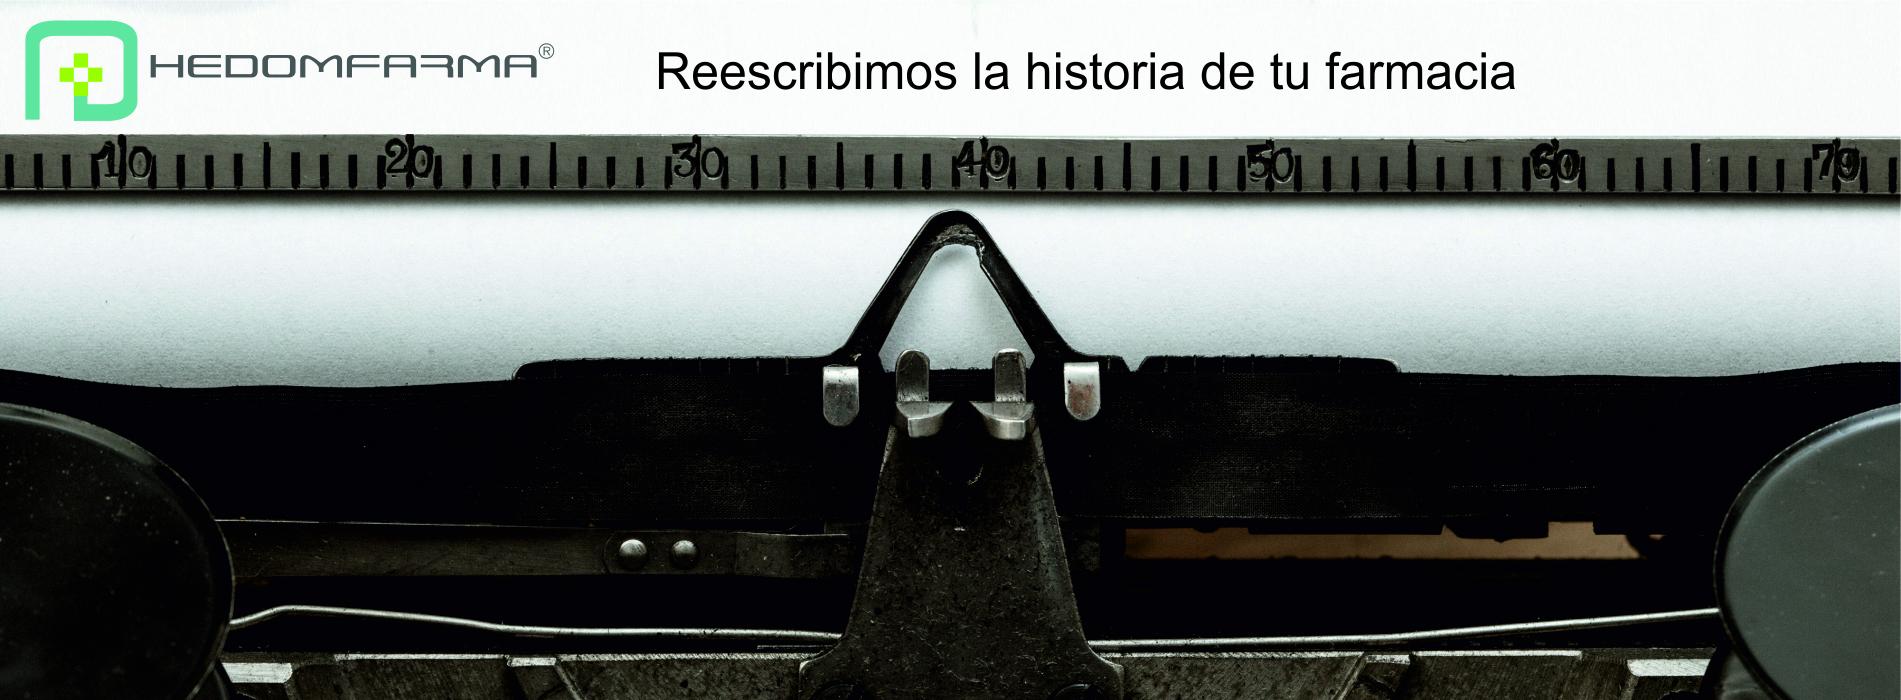 05 HEDOMFARMA PORTADA